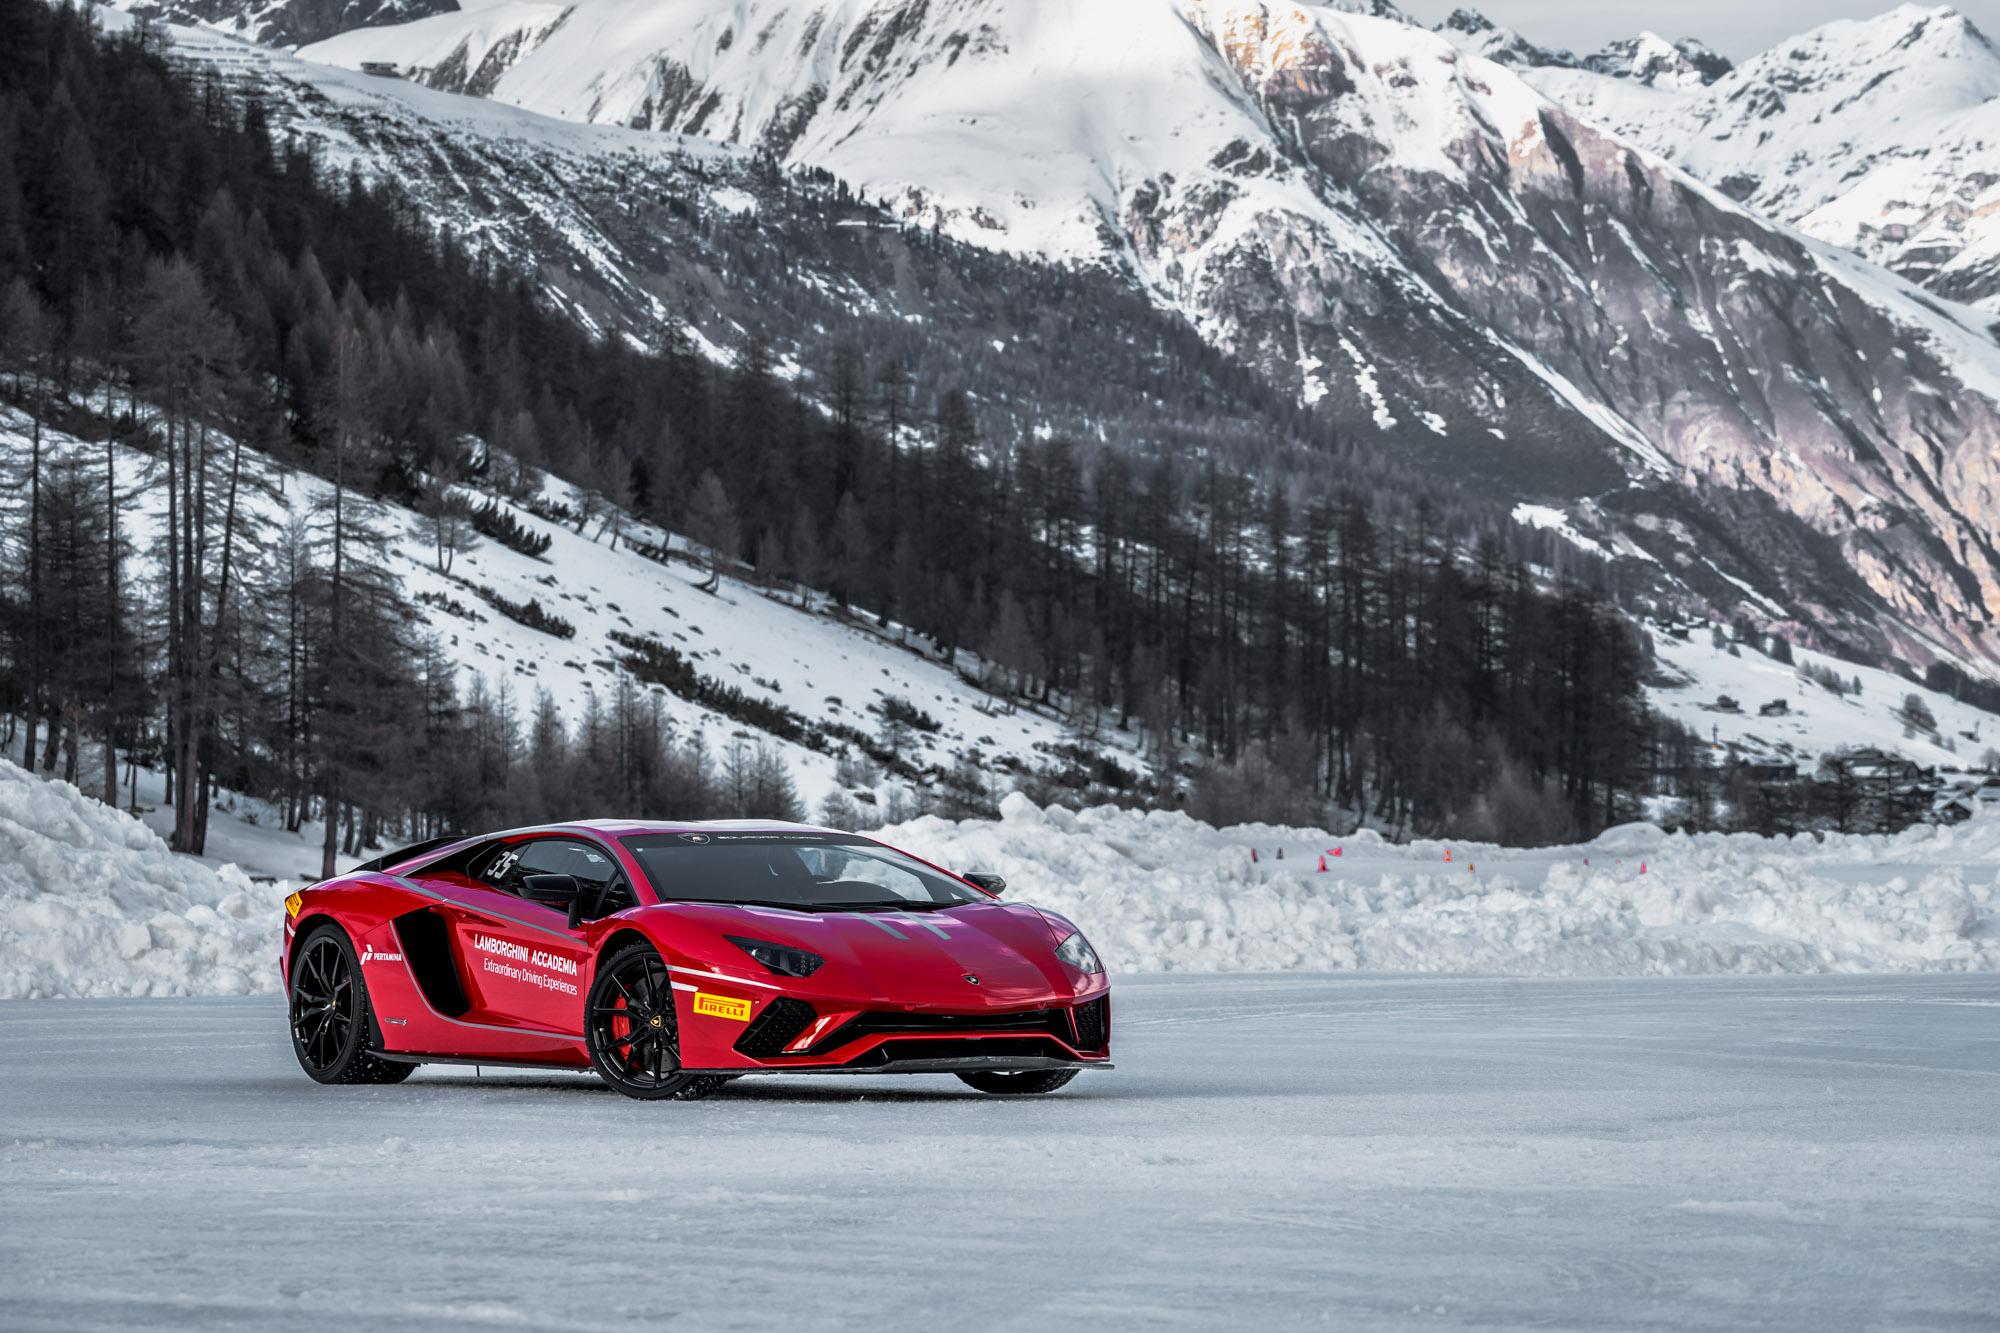 Lamborghini Winter Accademia featured